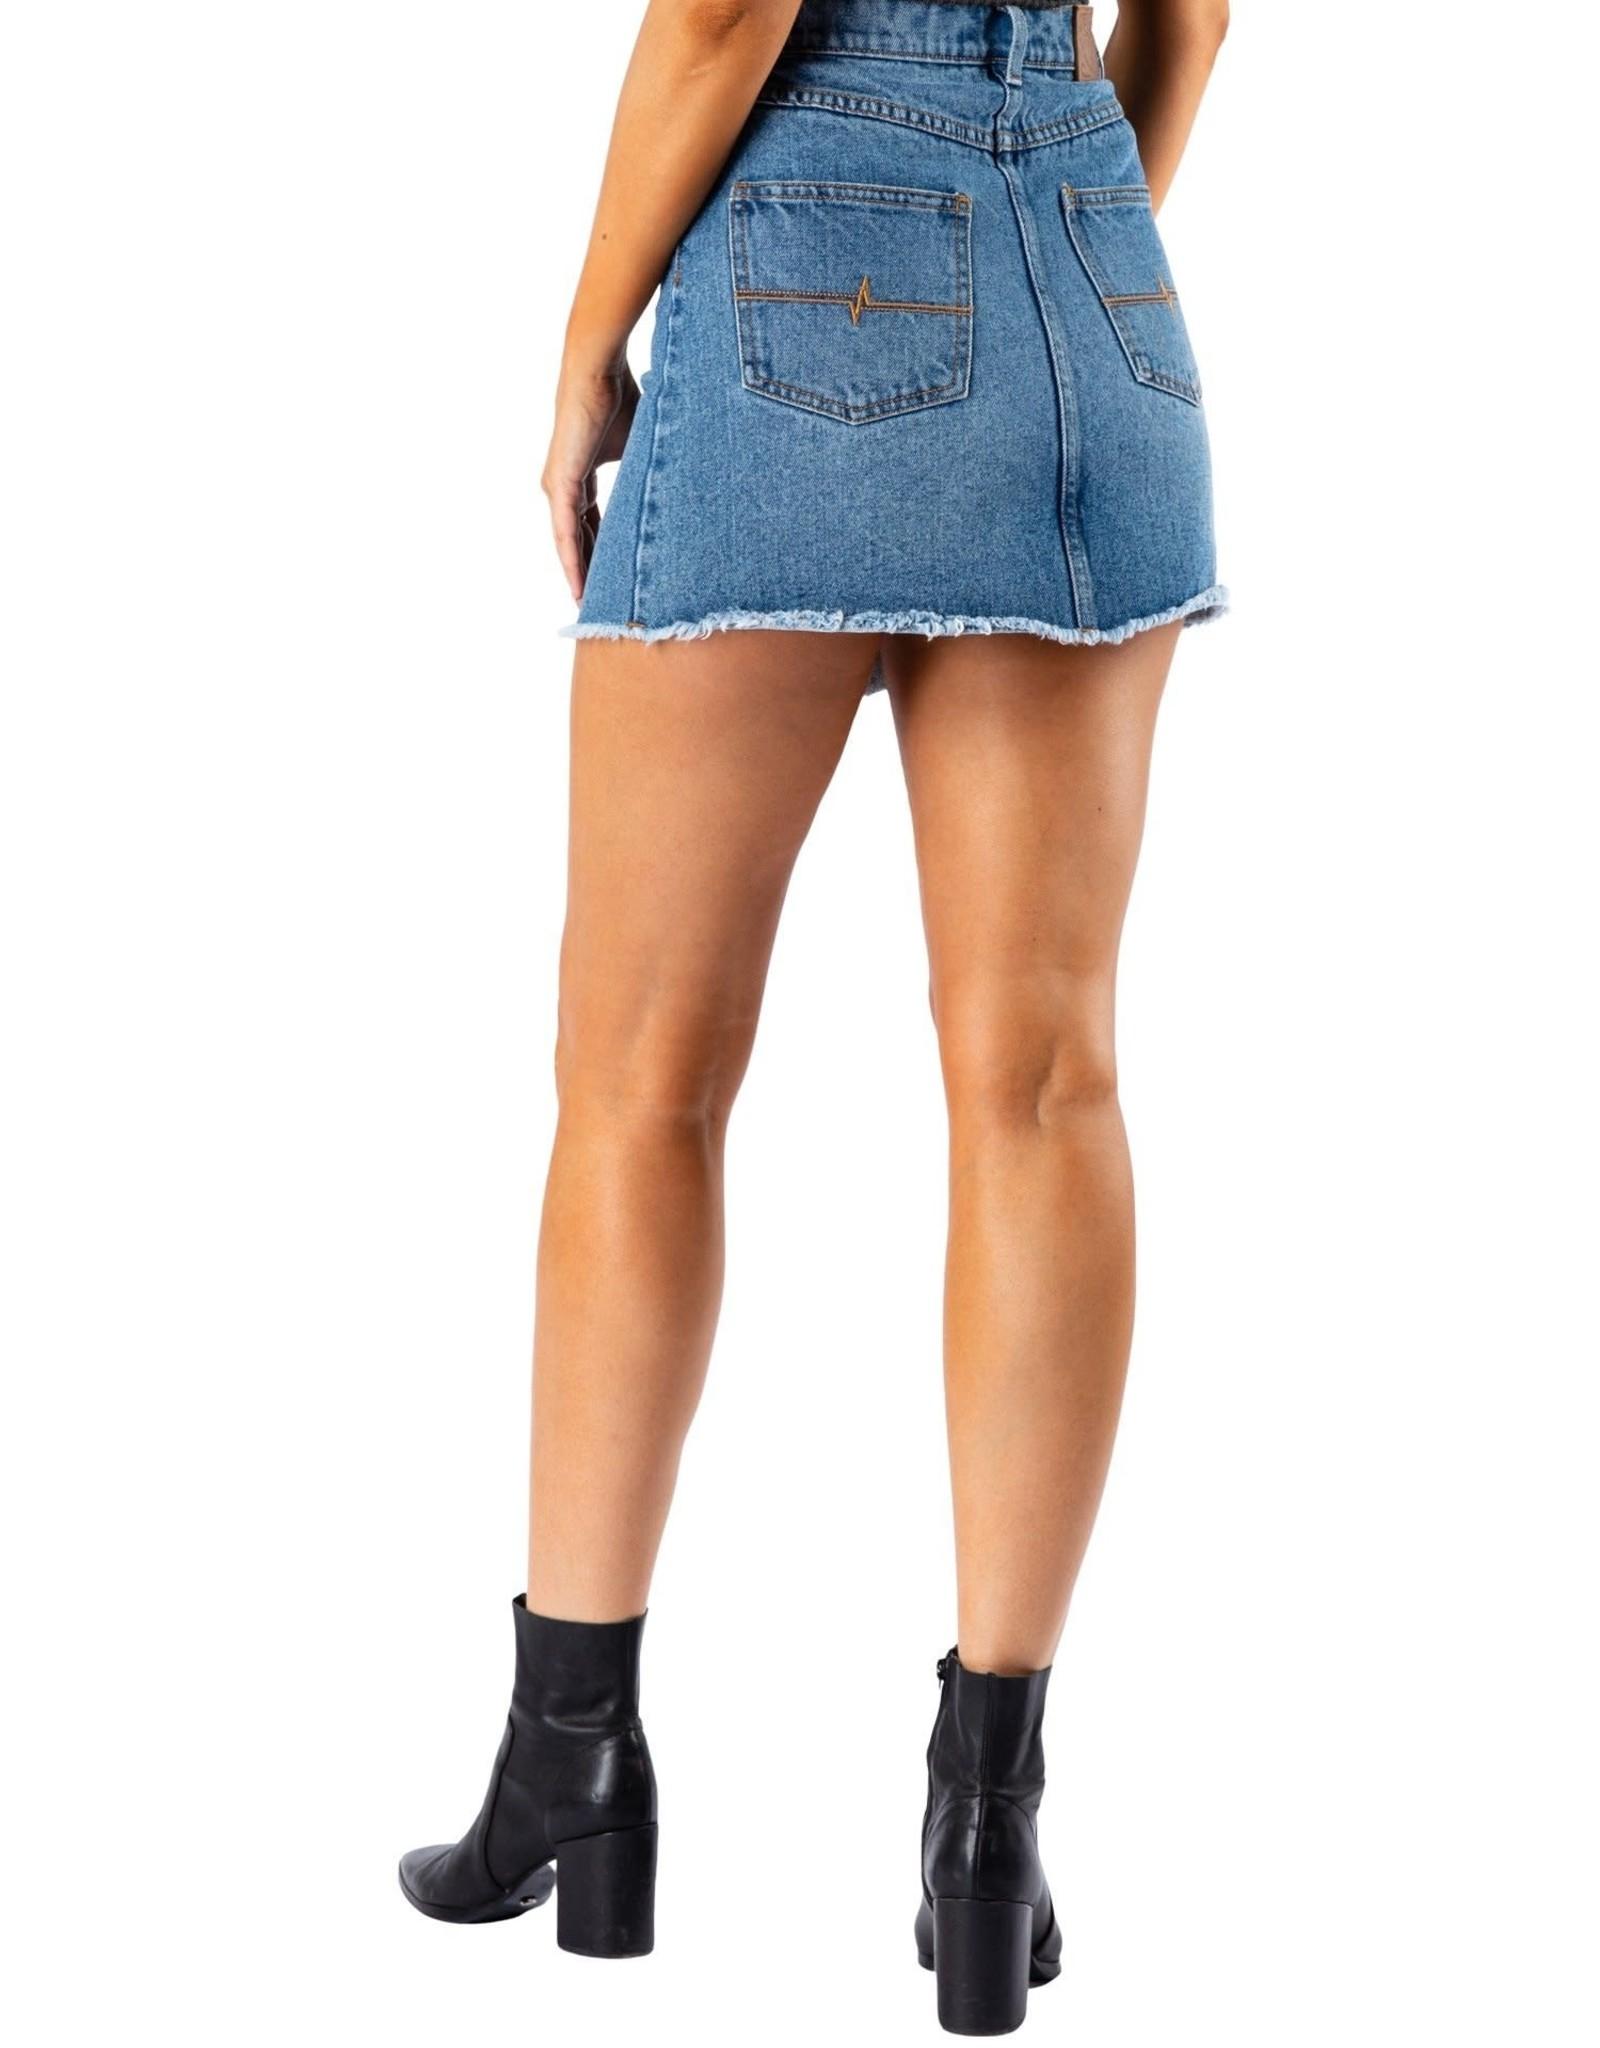 RUSTY Picasso Denim Skirt